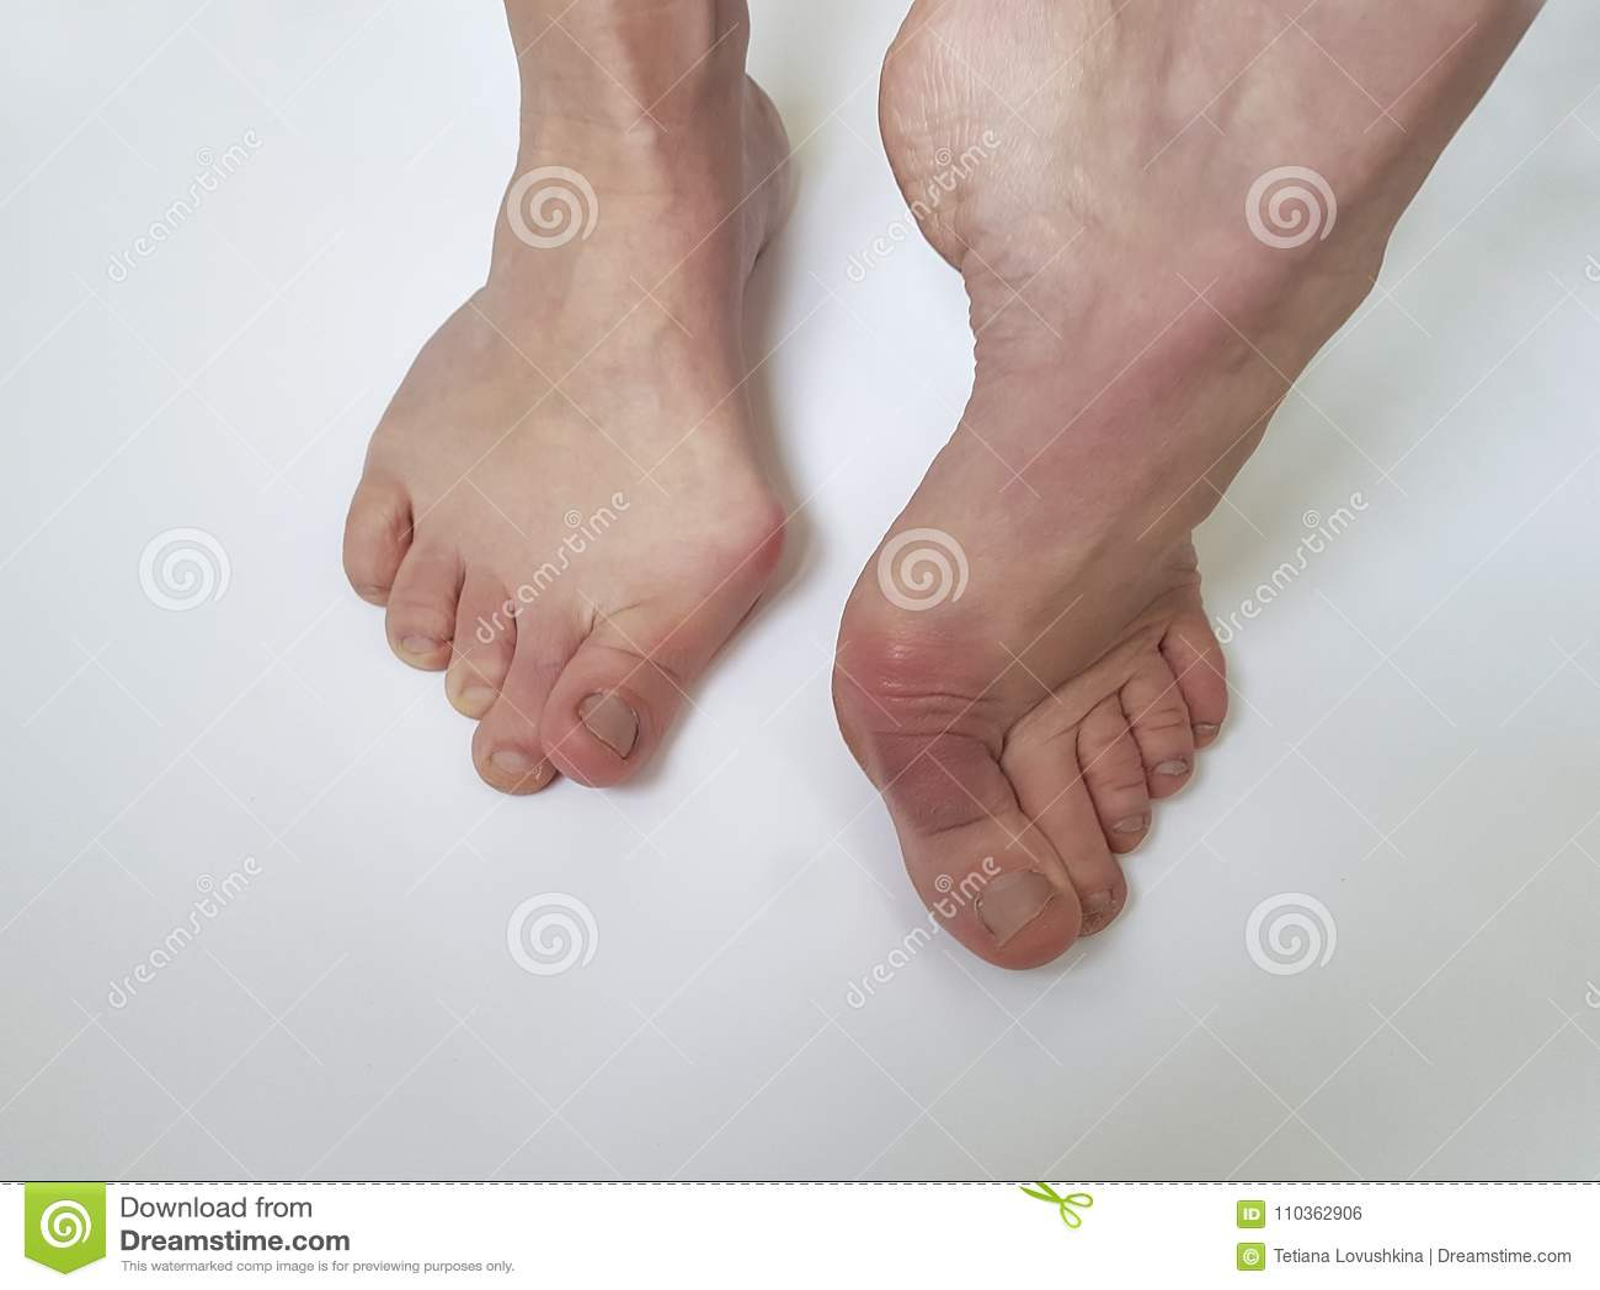 Hallux valgus female leg orthopedic deformity painful on a white background